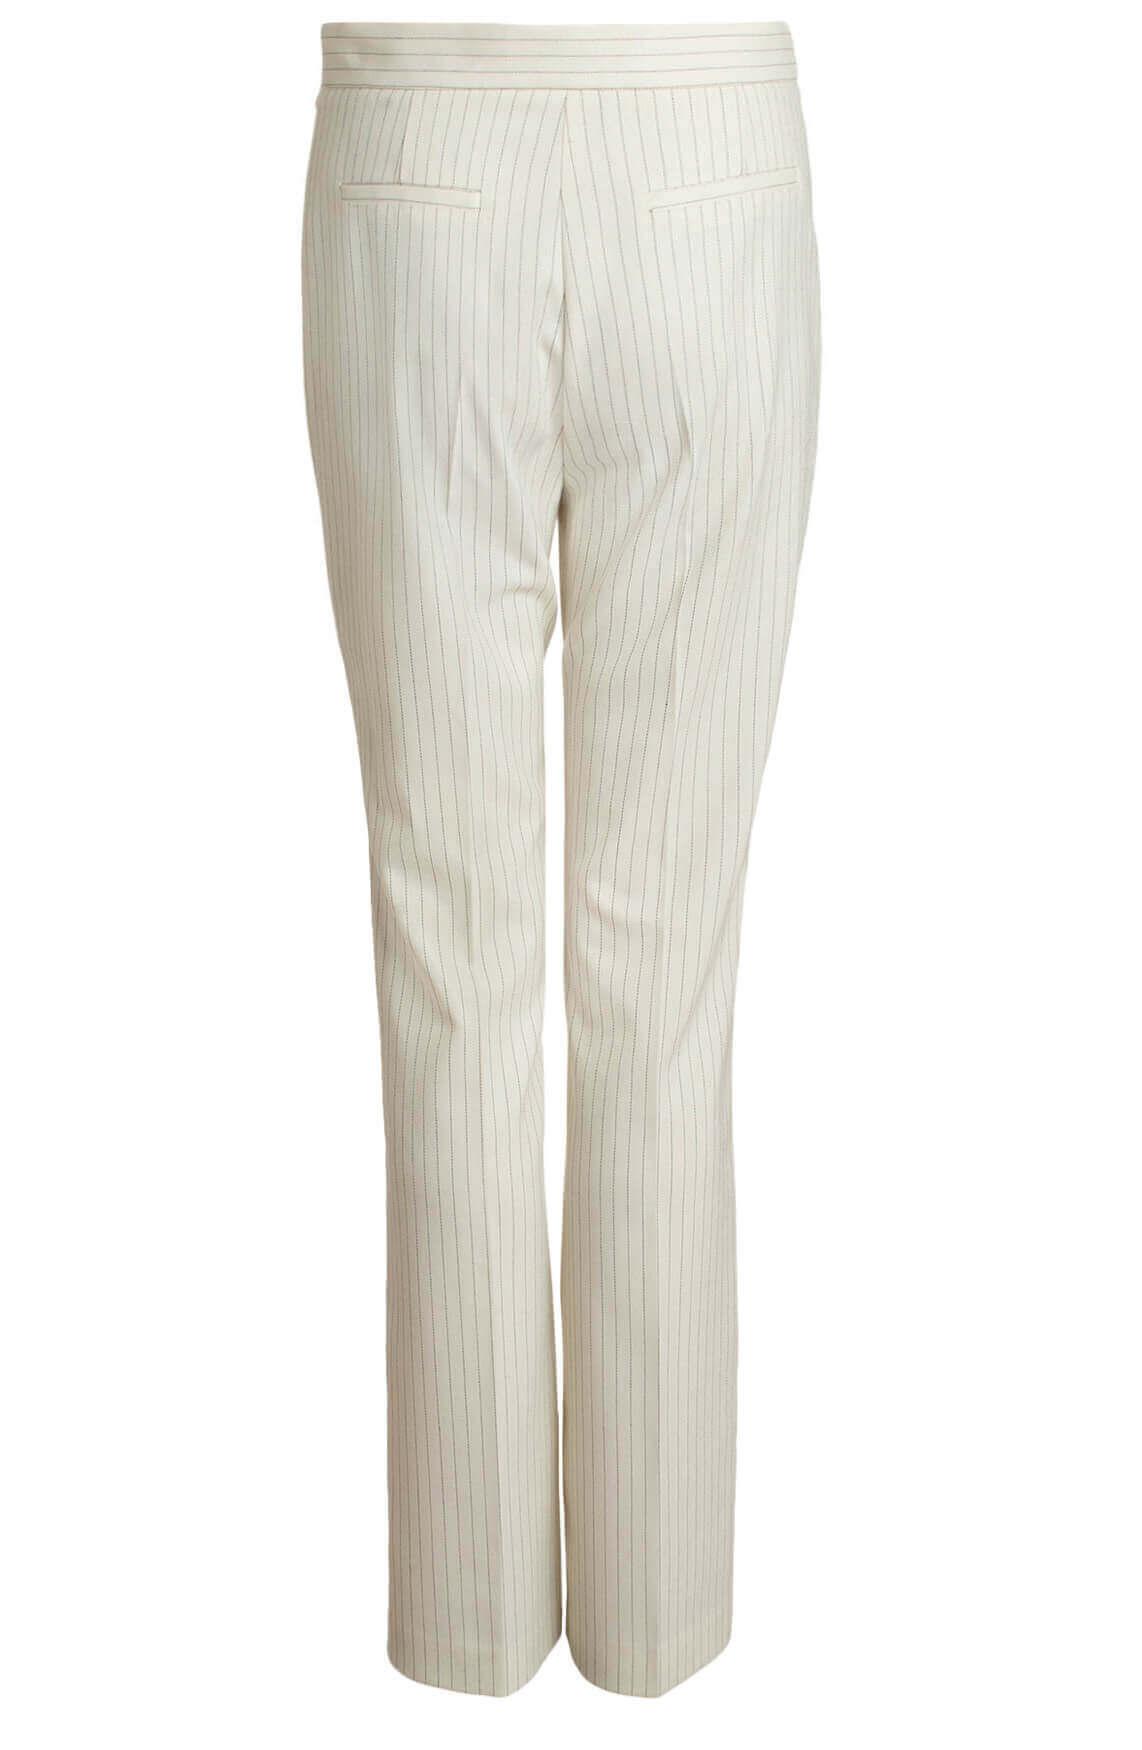 Anna Dames Pantalon met fijne krijtstreep wit